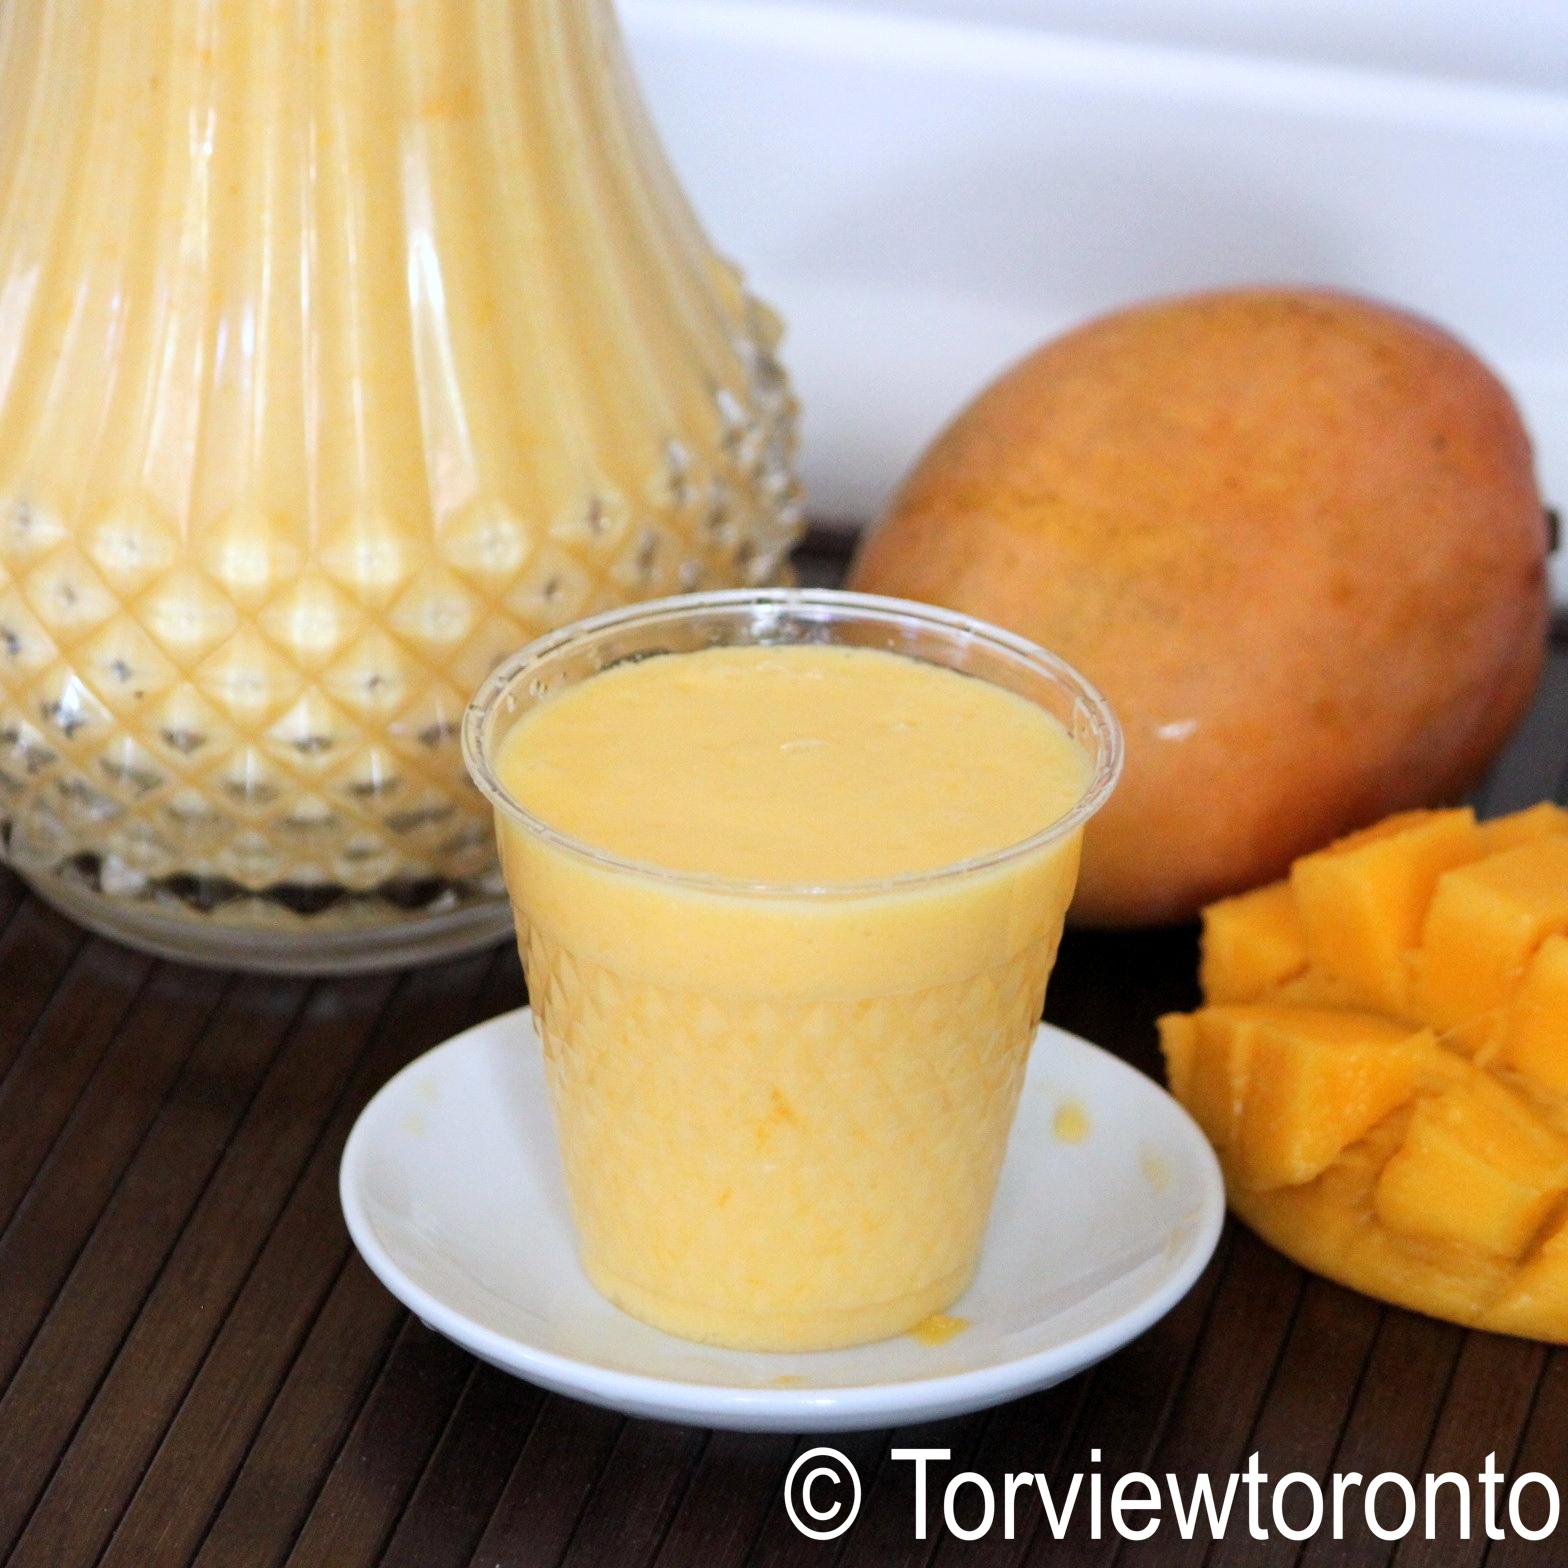 Torviewtoronto: Mango milkshake